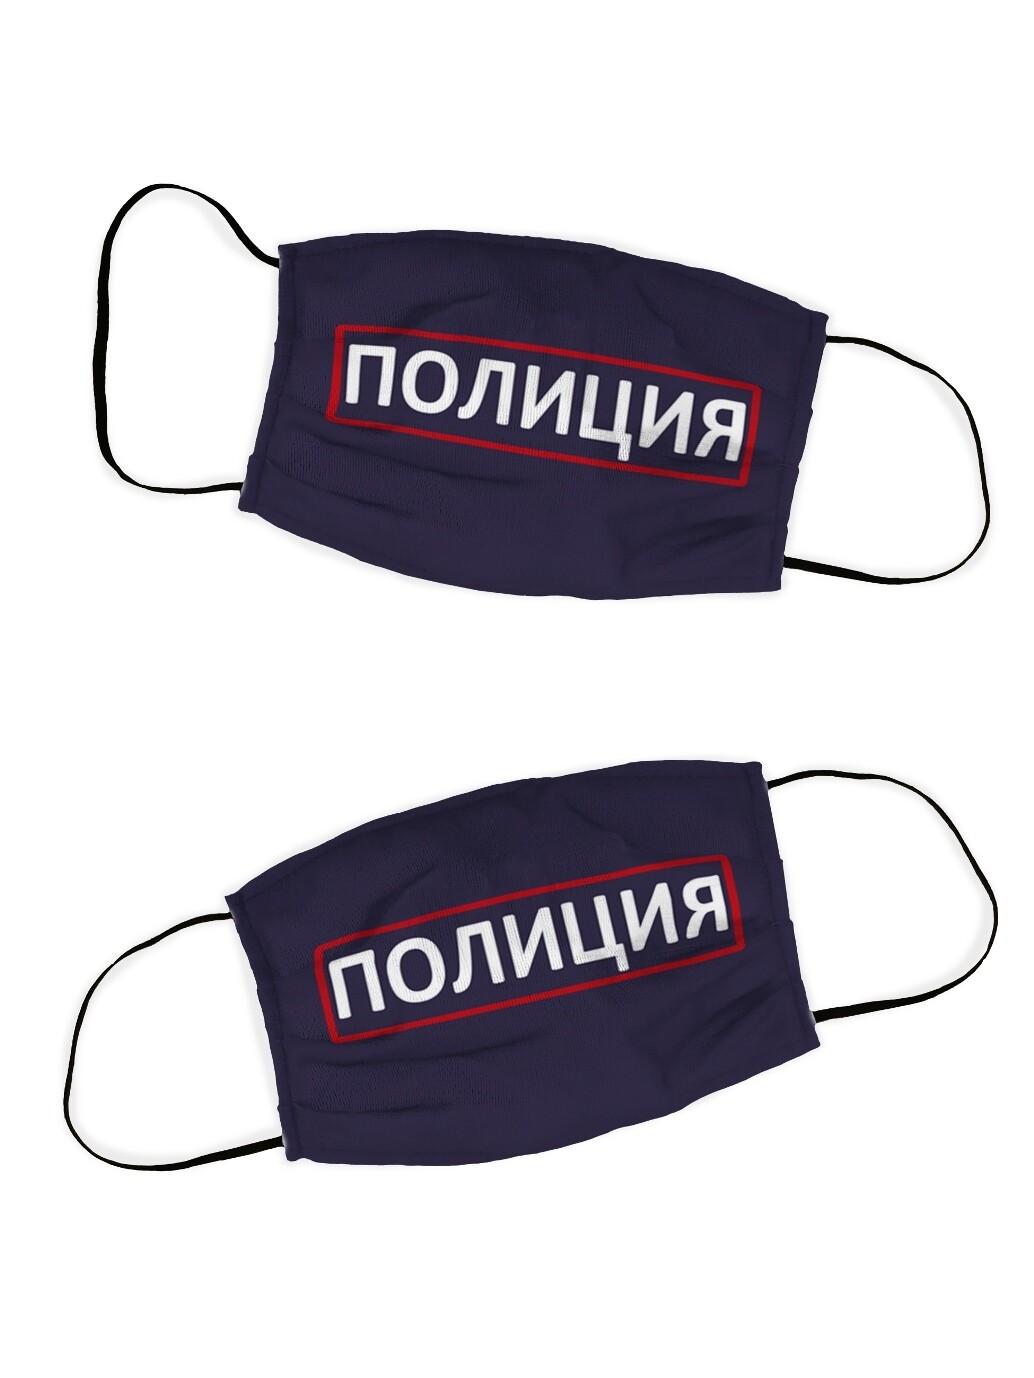 Защитная маска набор 2 шт. Полиция